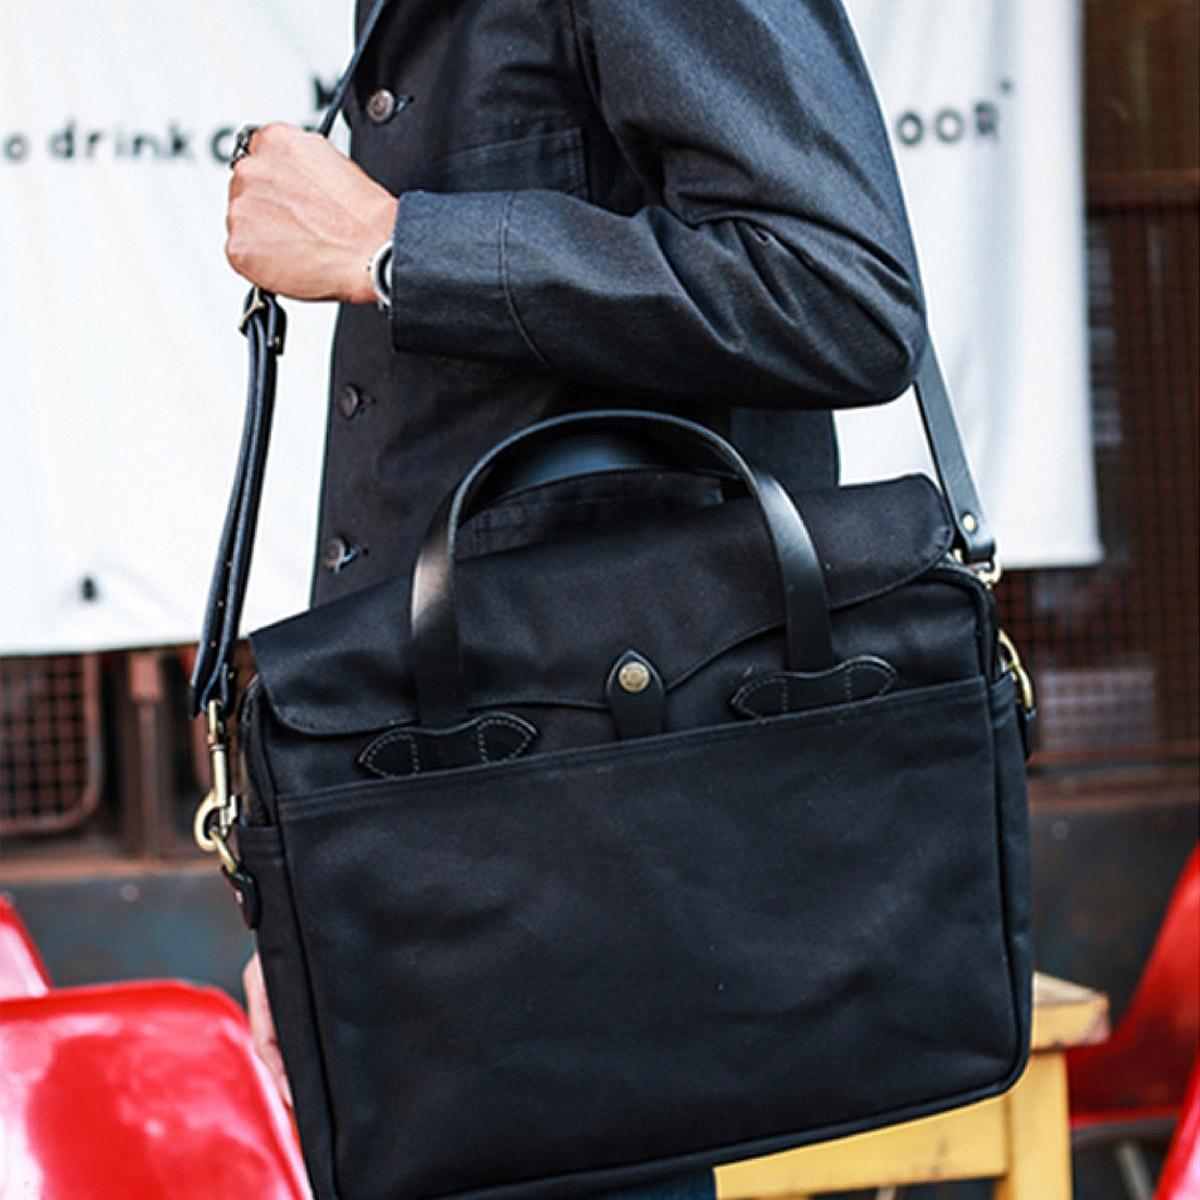 Filson Original Briefcase 11070256 Black streetwear, lifestyle